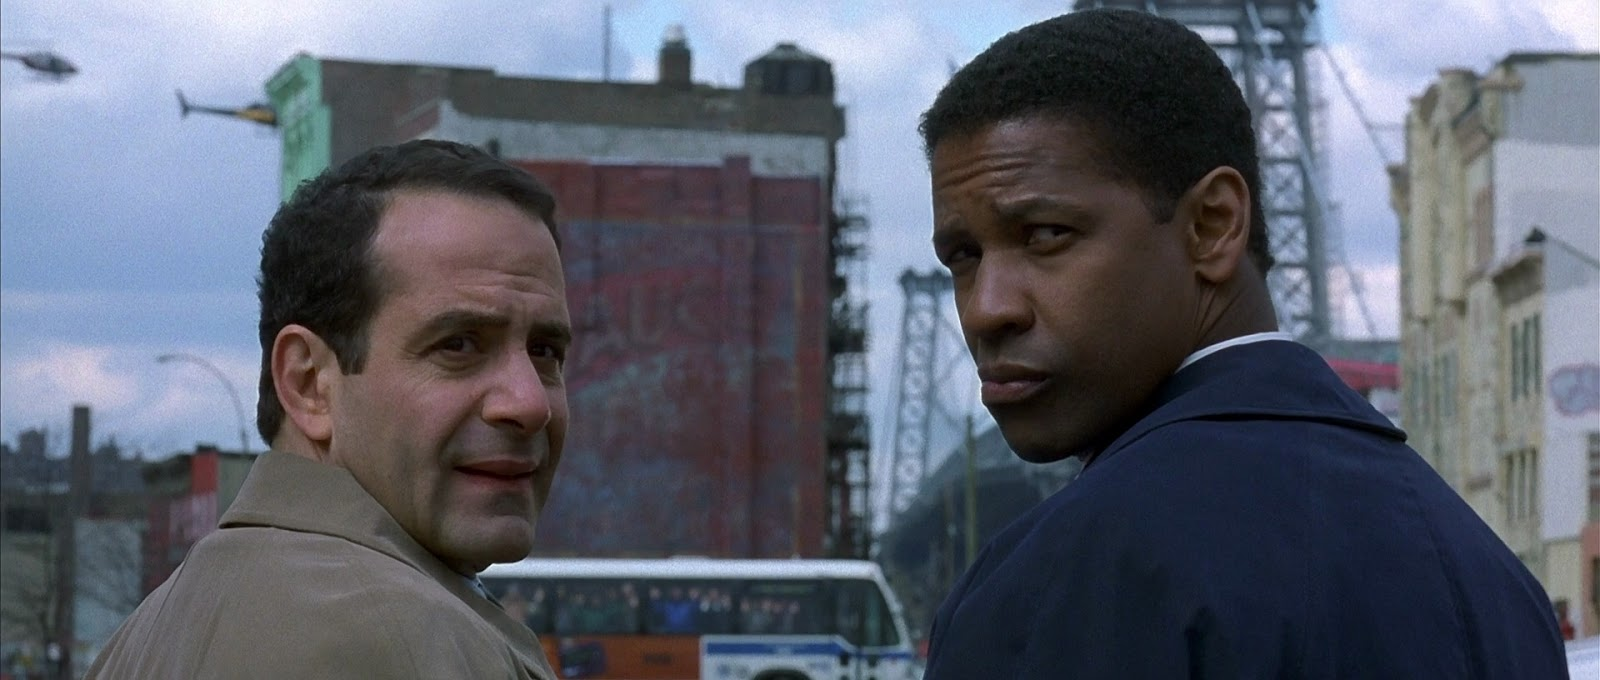 Tony Shalhoub and Denzel Washington